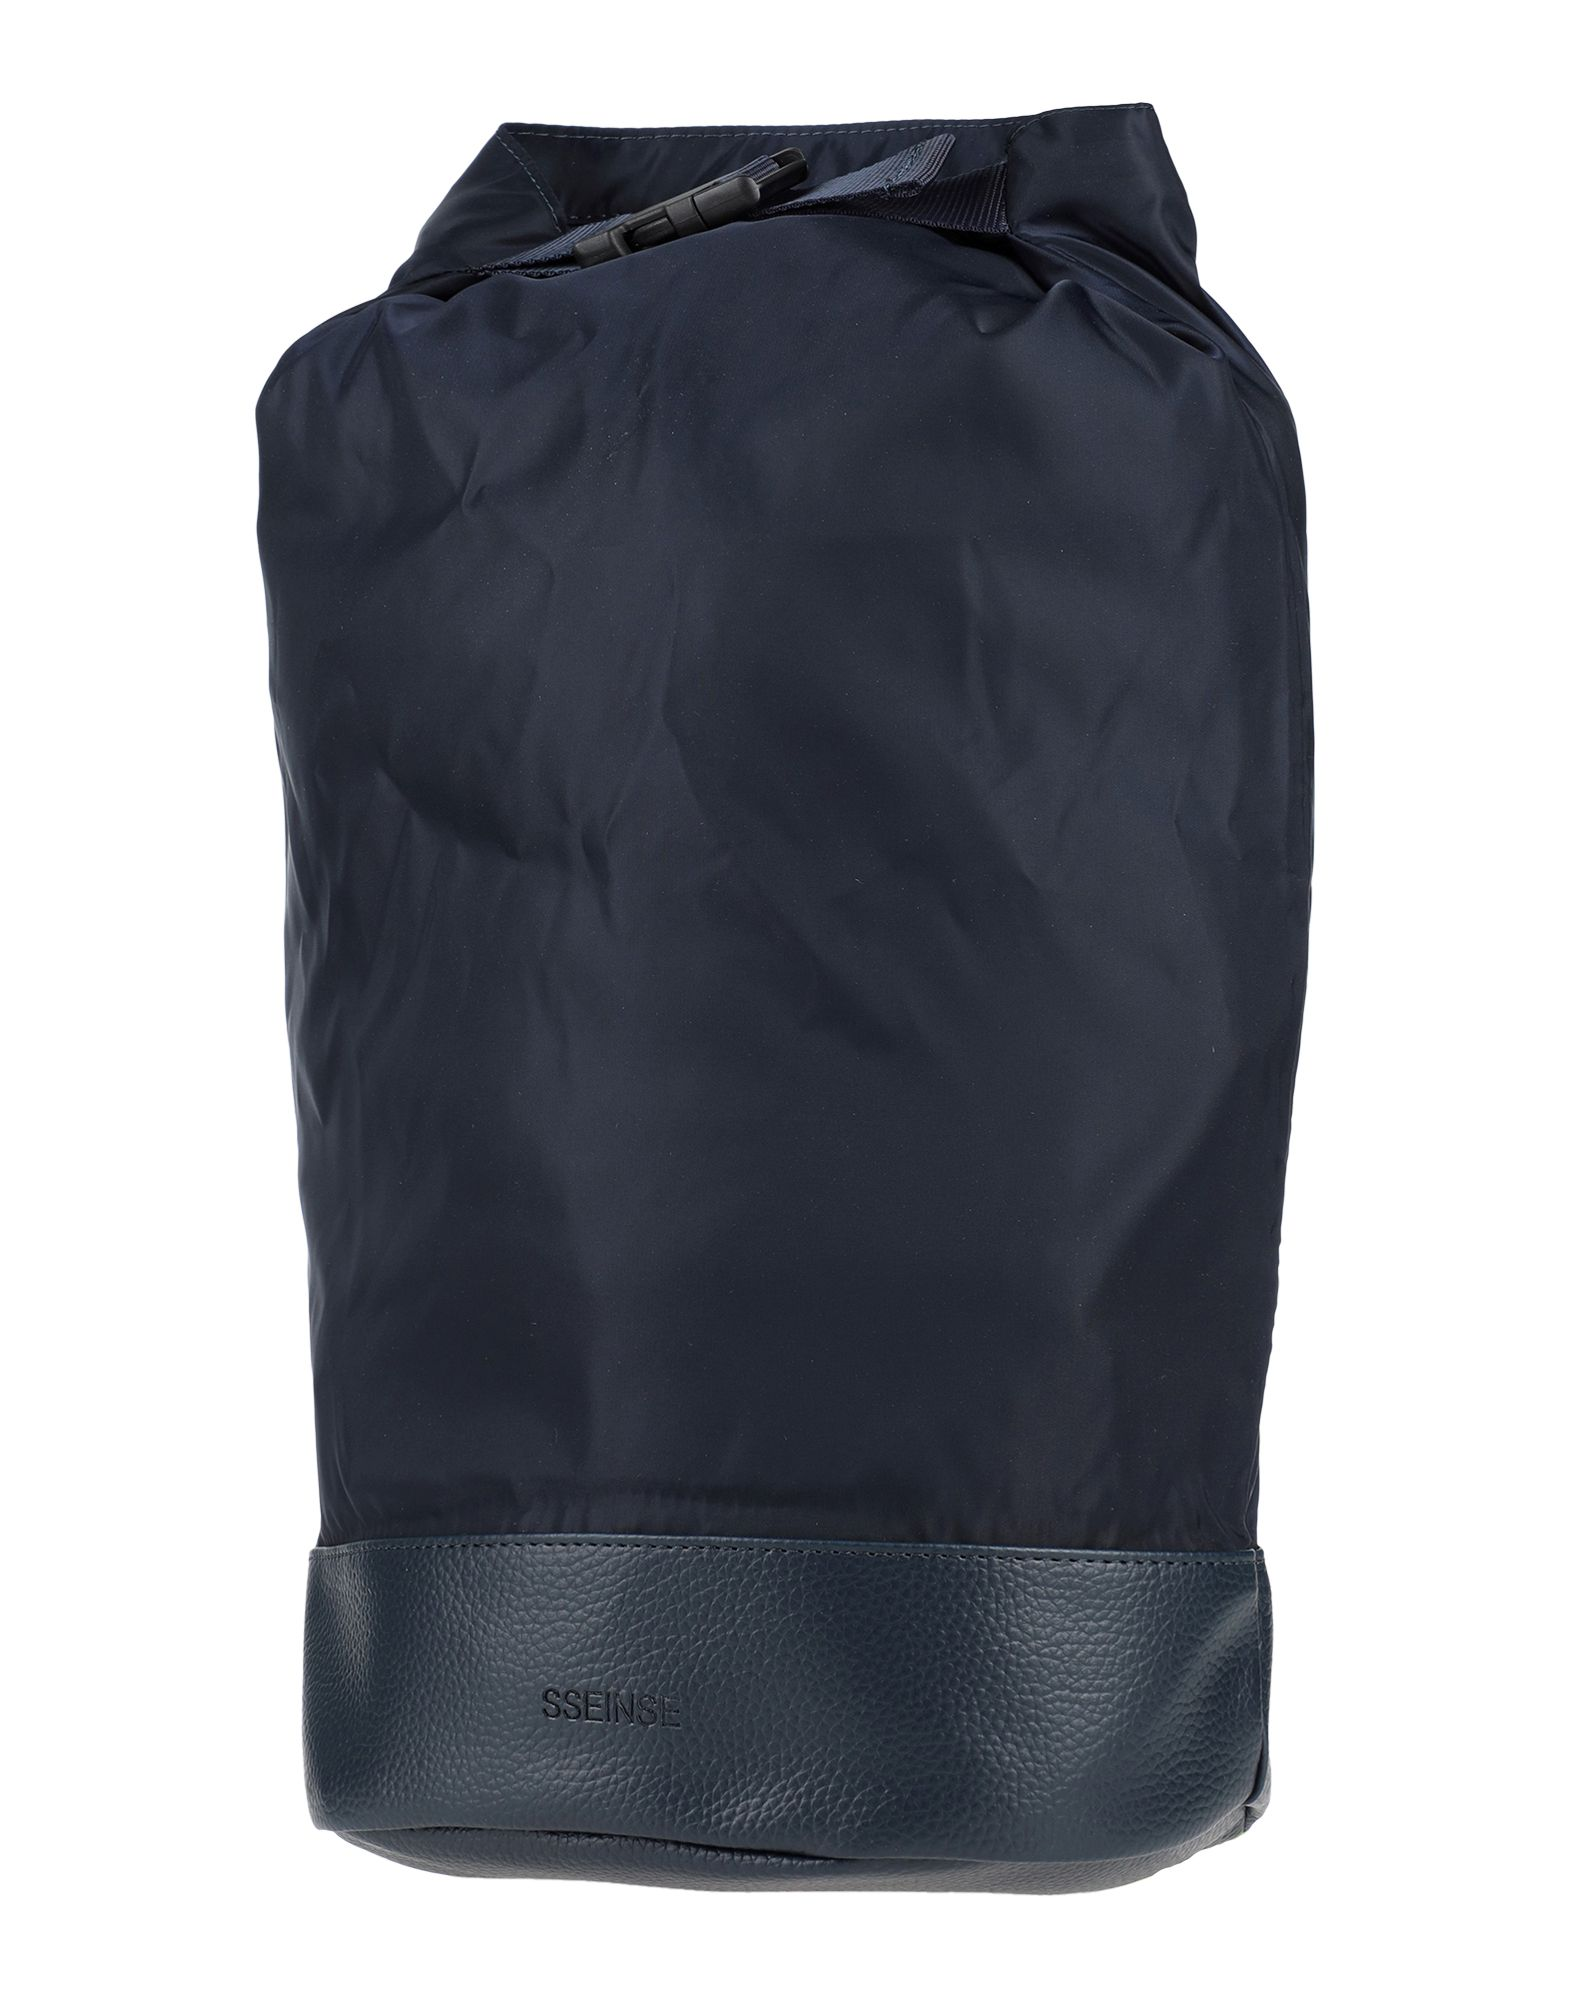 SSEINSE Рюкзаки и сумки на пояс сумки magnolia сумка женская a761 7363 лак искусственная кожа page 8